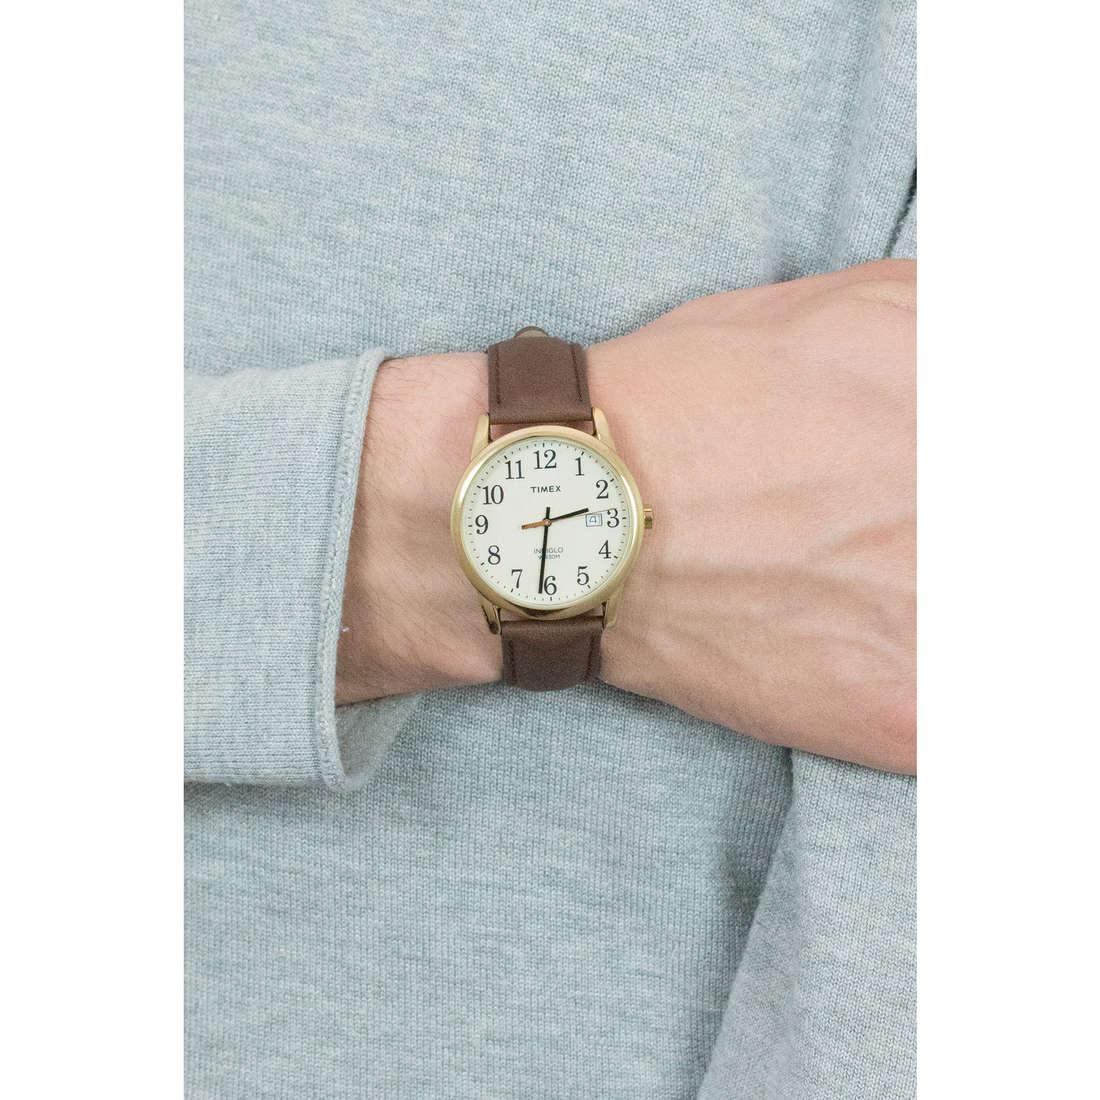 Timex solo tempo Easy Reader uomo TW2P75800 indosso